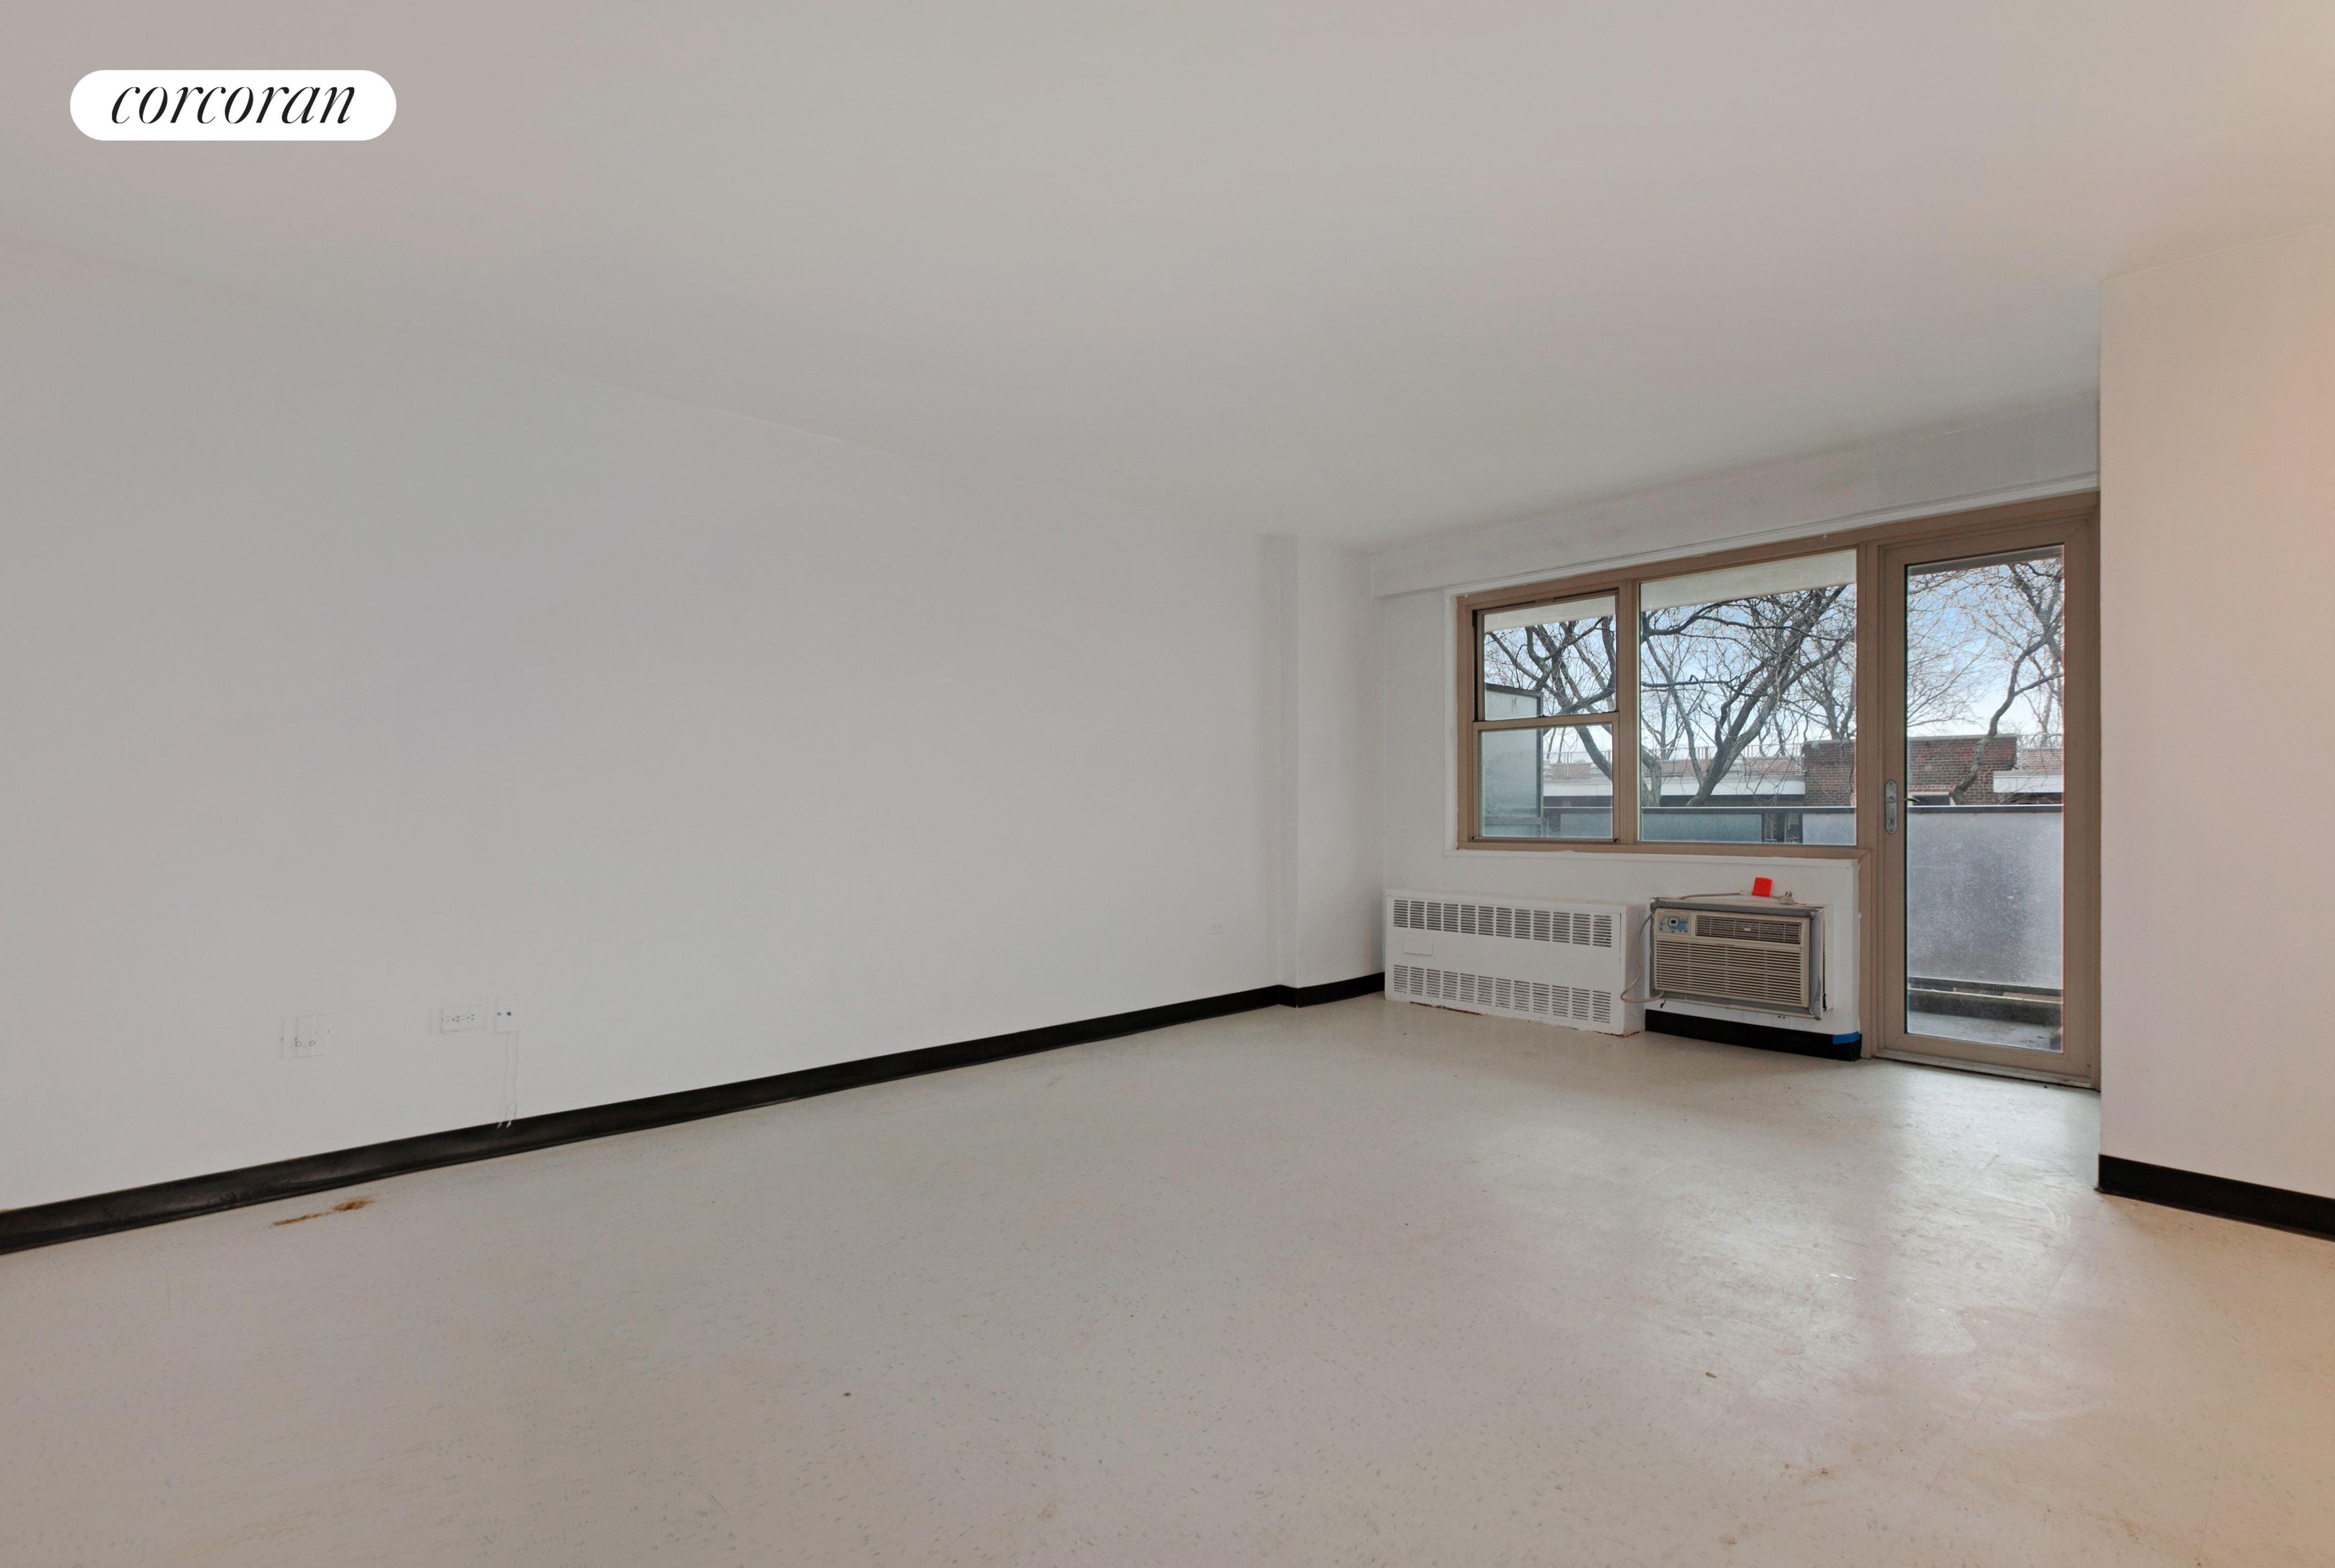 Gateway Elton Apartments Floor Plans: Corcoran, 380 Cozine Avenue, Apt. 4B, East New York